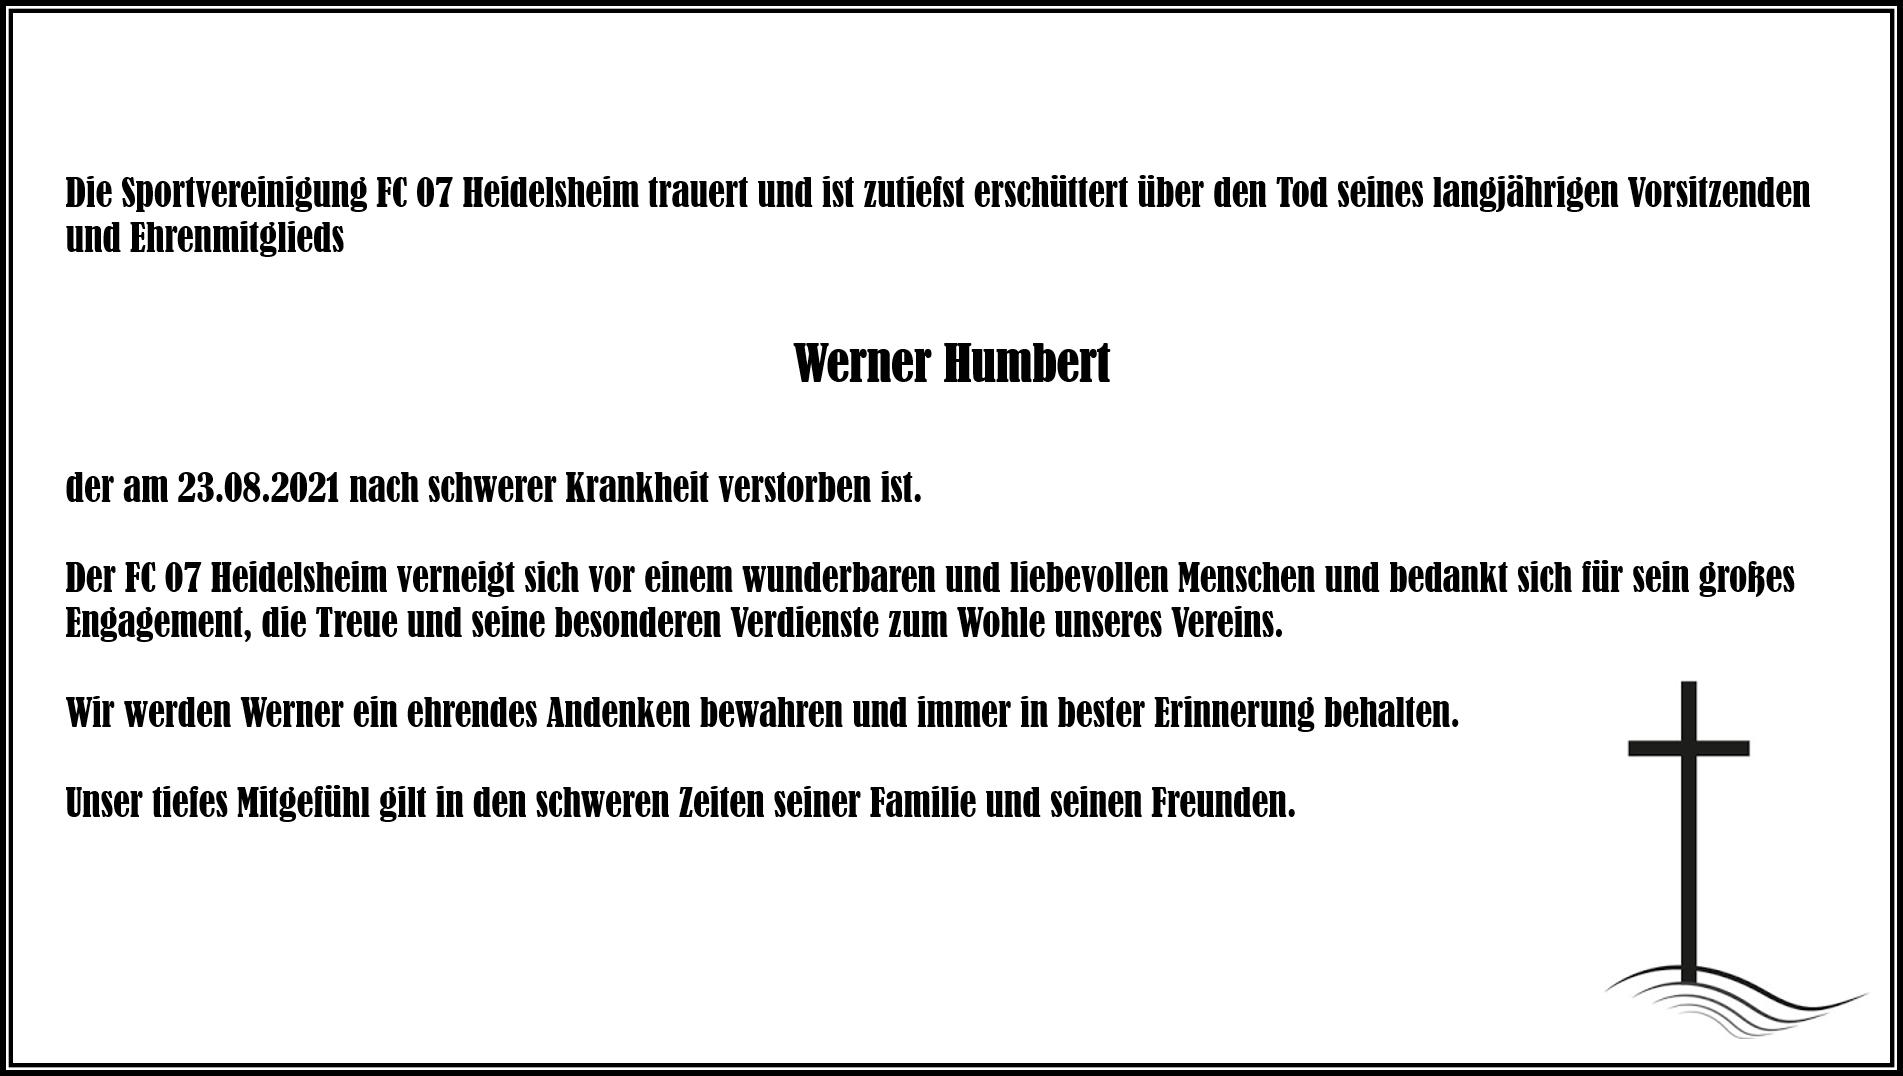 Der FC-07 Heidelsheim trauert um Werner Humbert!